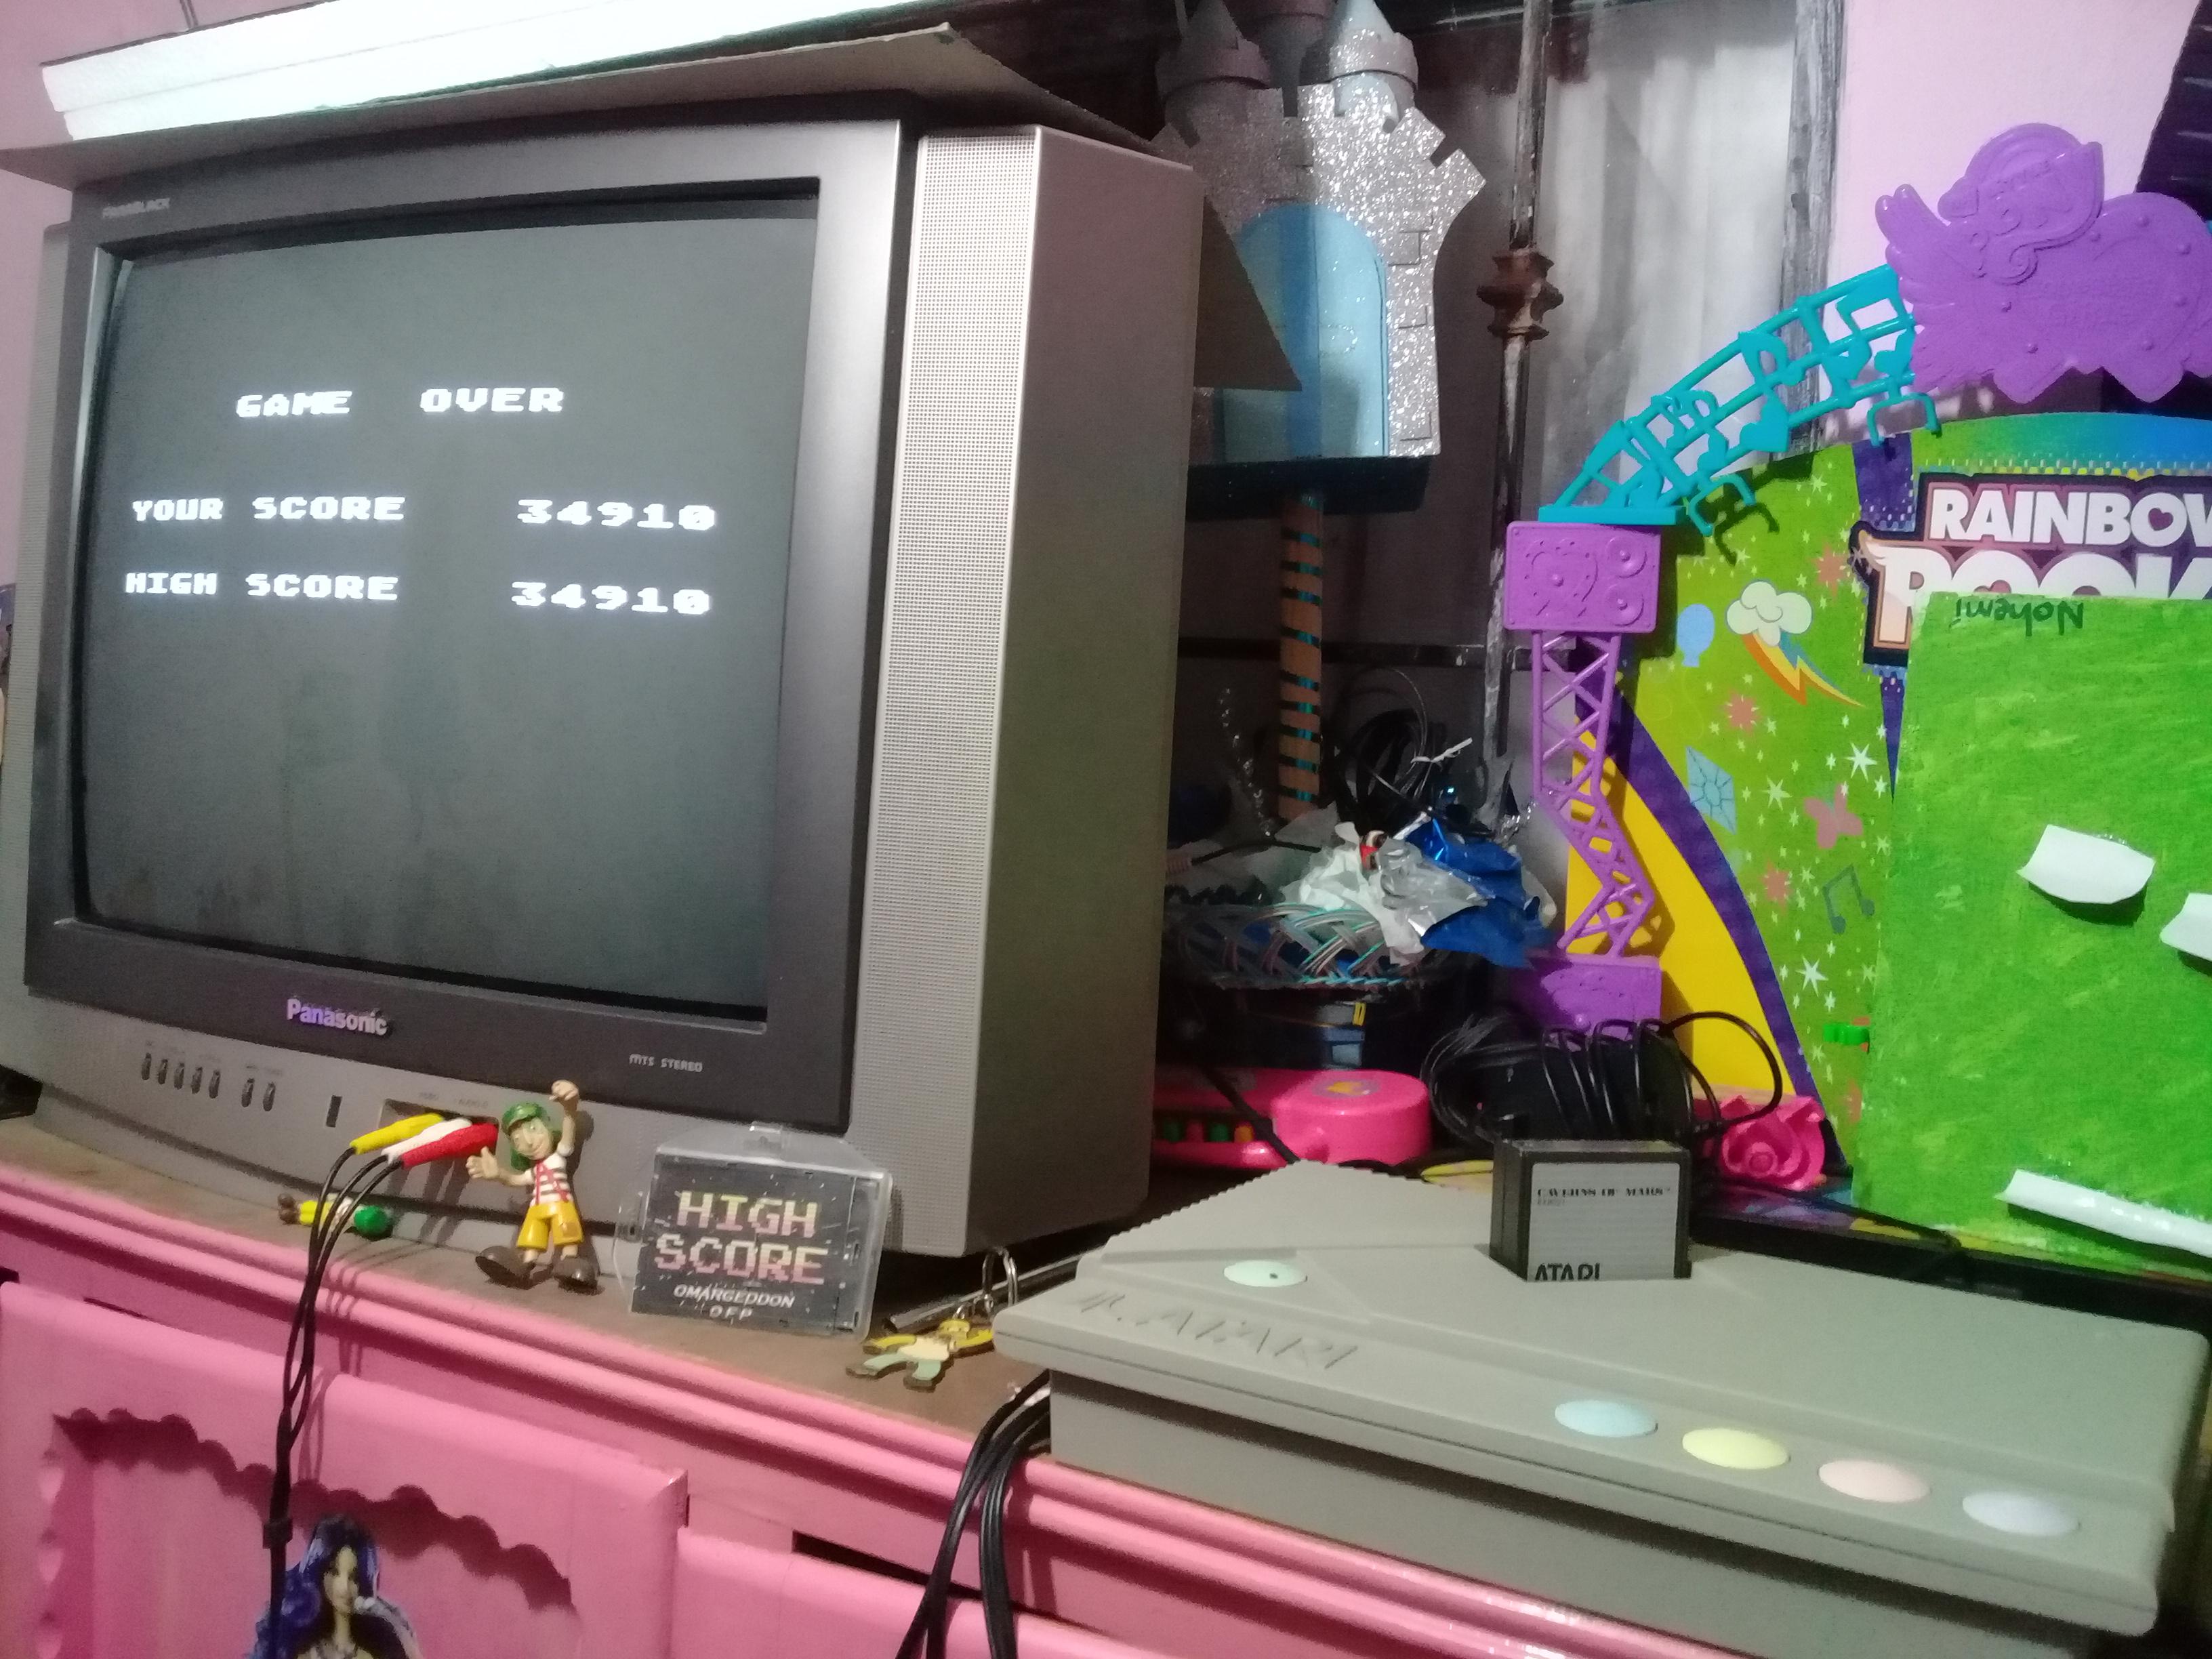 omargeddon: Caverns of Mars [Warrior] (Atari 400/800/XL/XE) 34,910 points on 2019-01-08 17:59:45